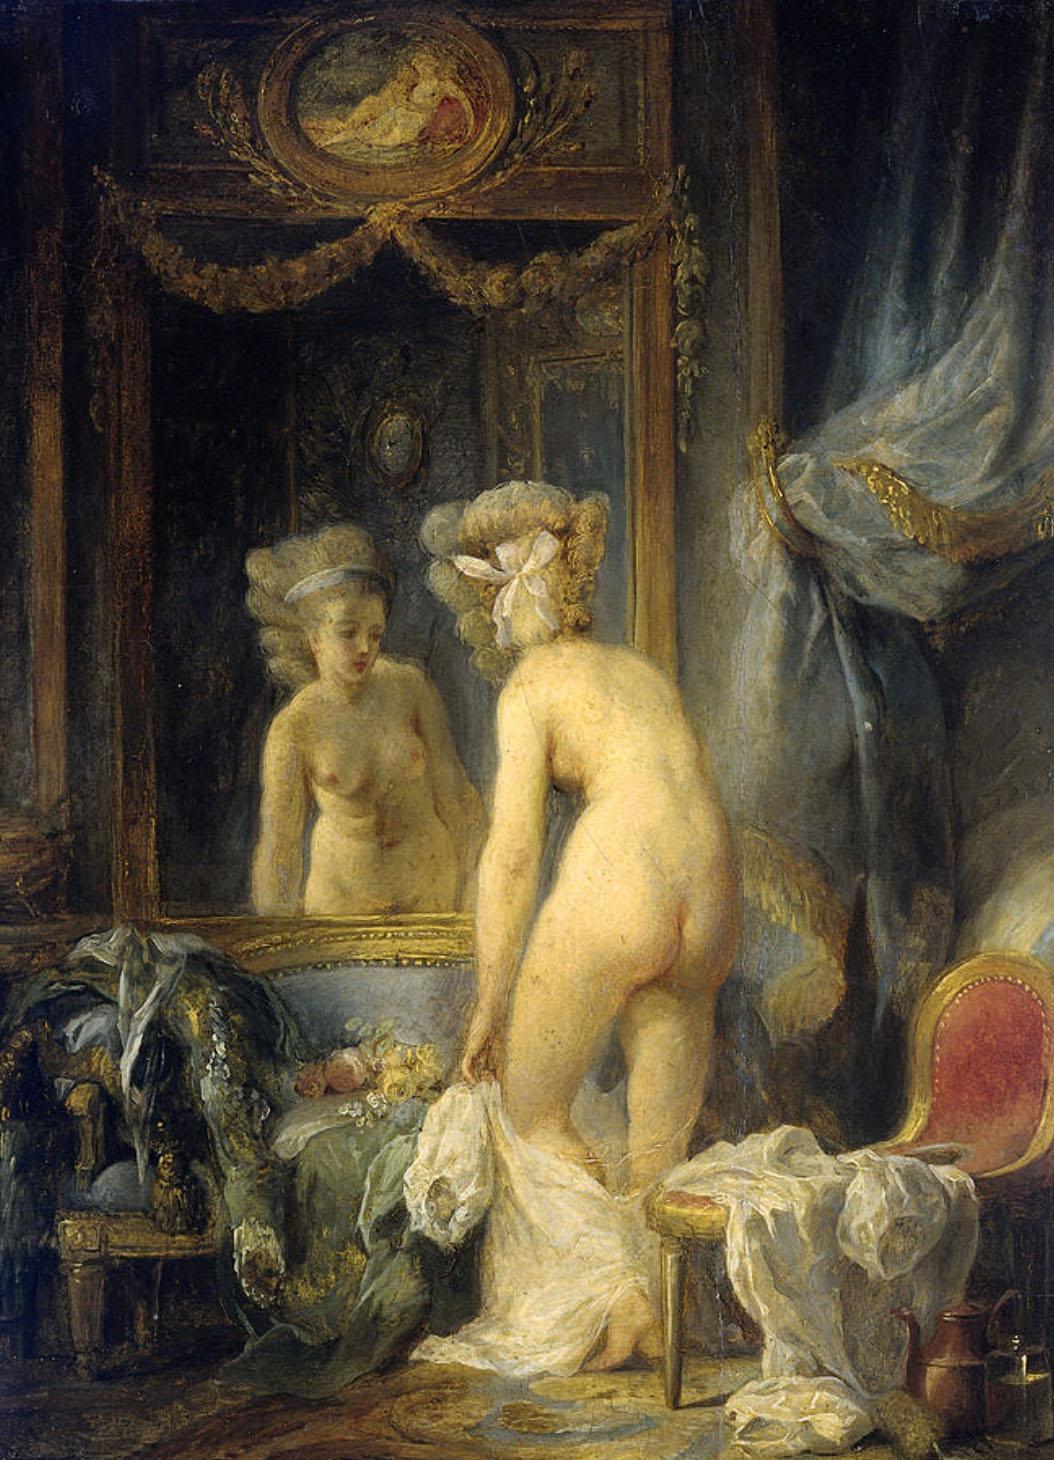 Jean Frédéric Schall. Baño de la mañana. Rijksmuseum. Amsterdam.